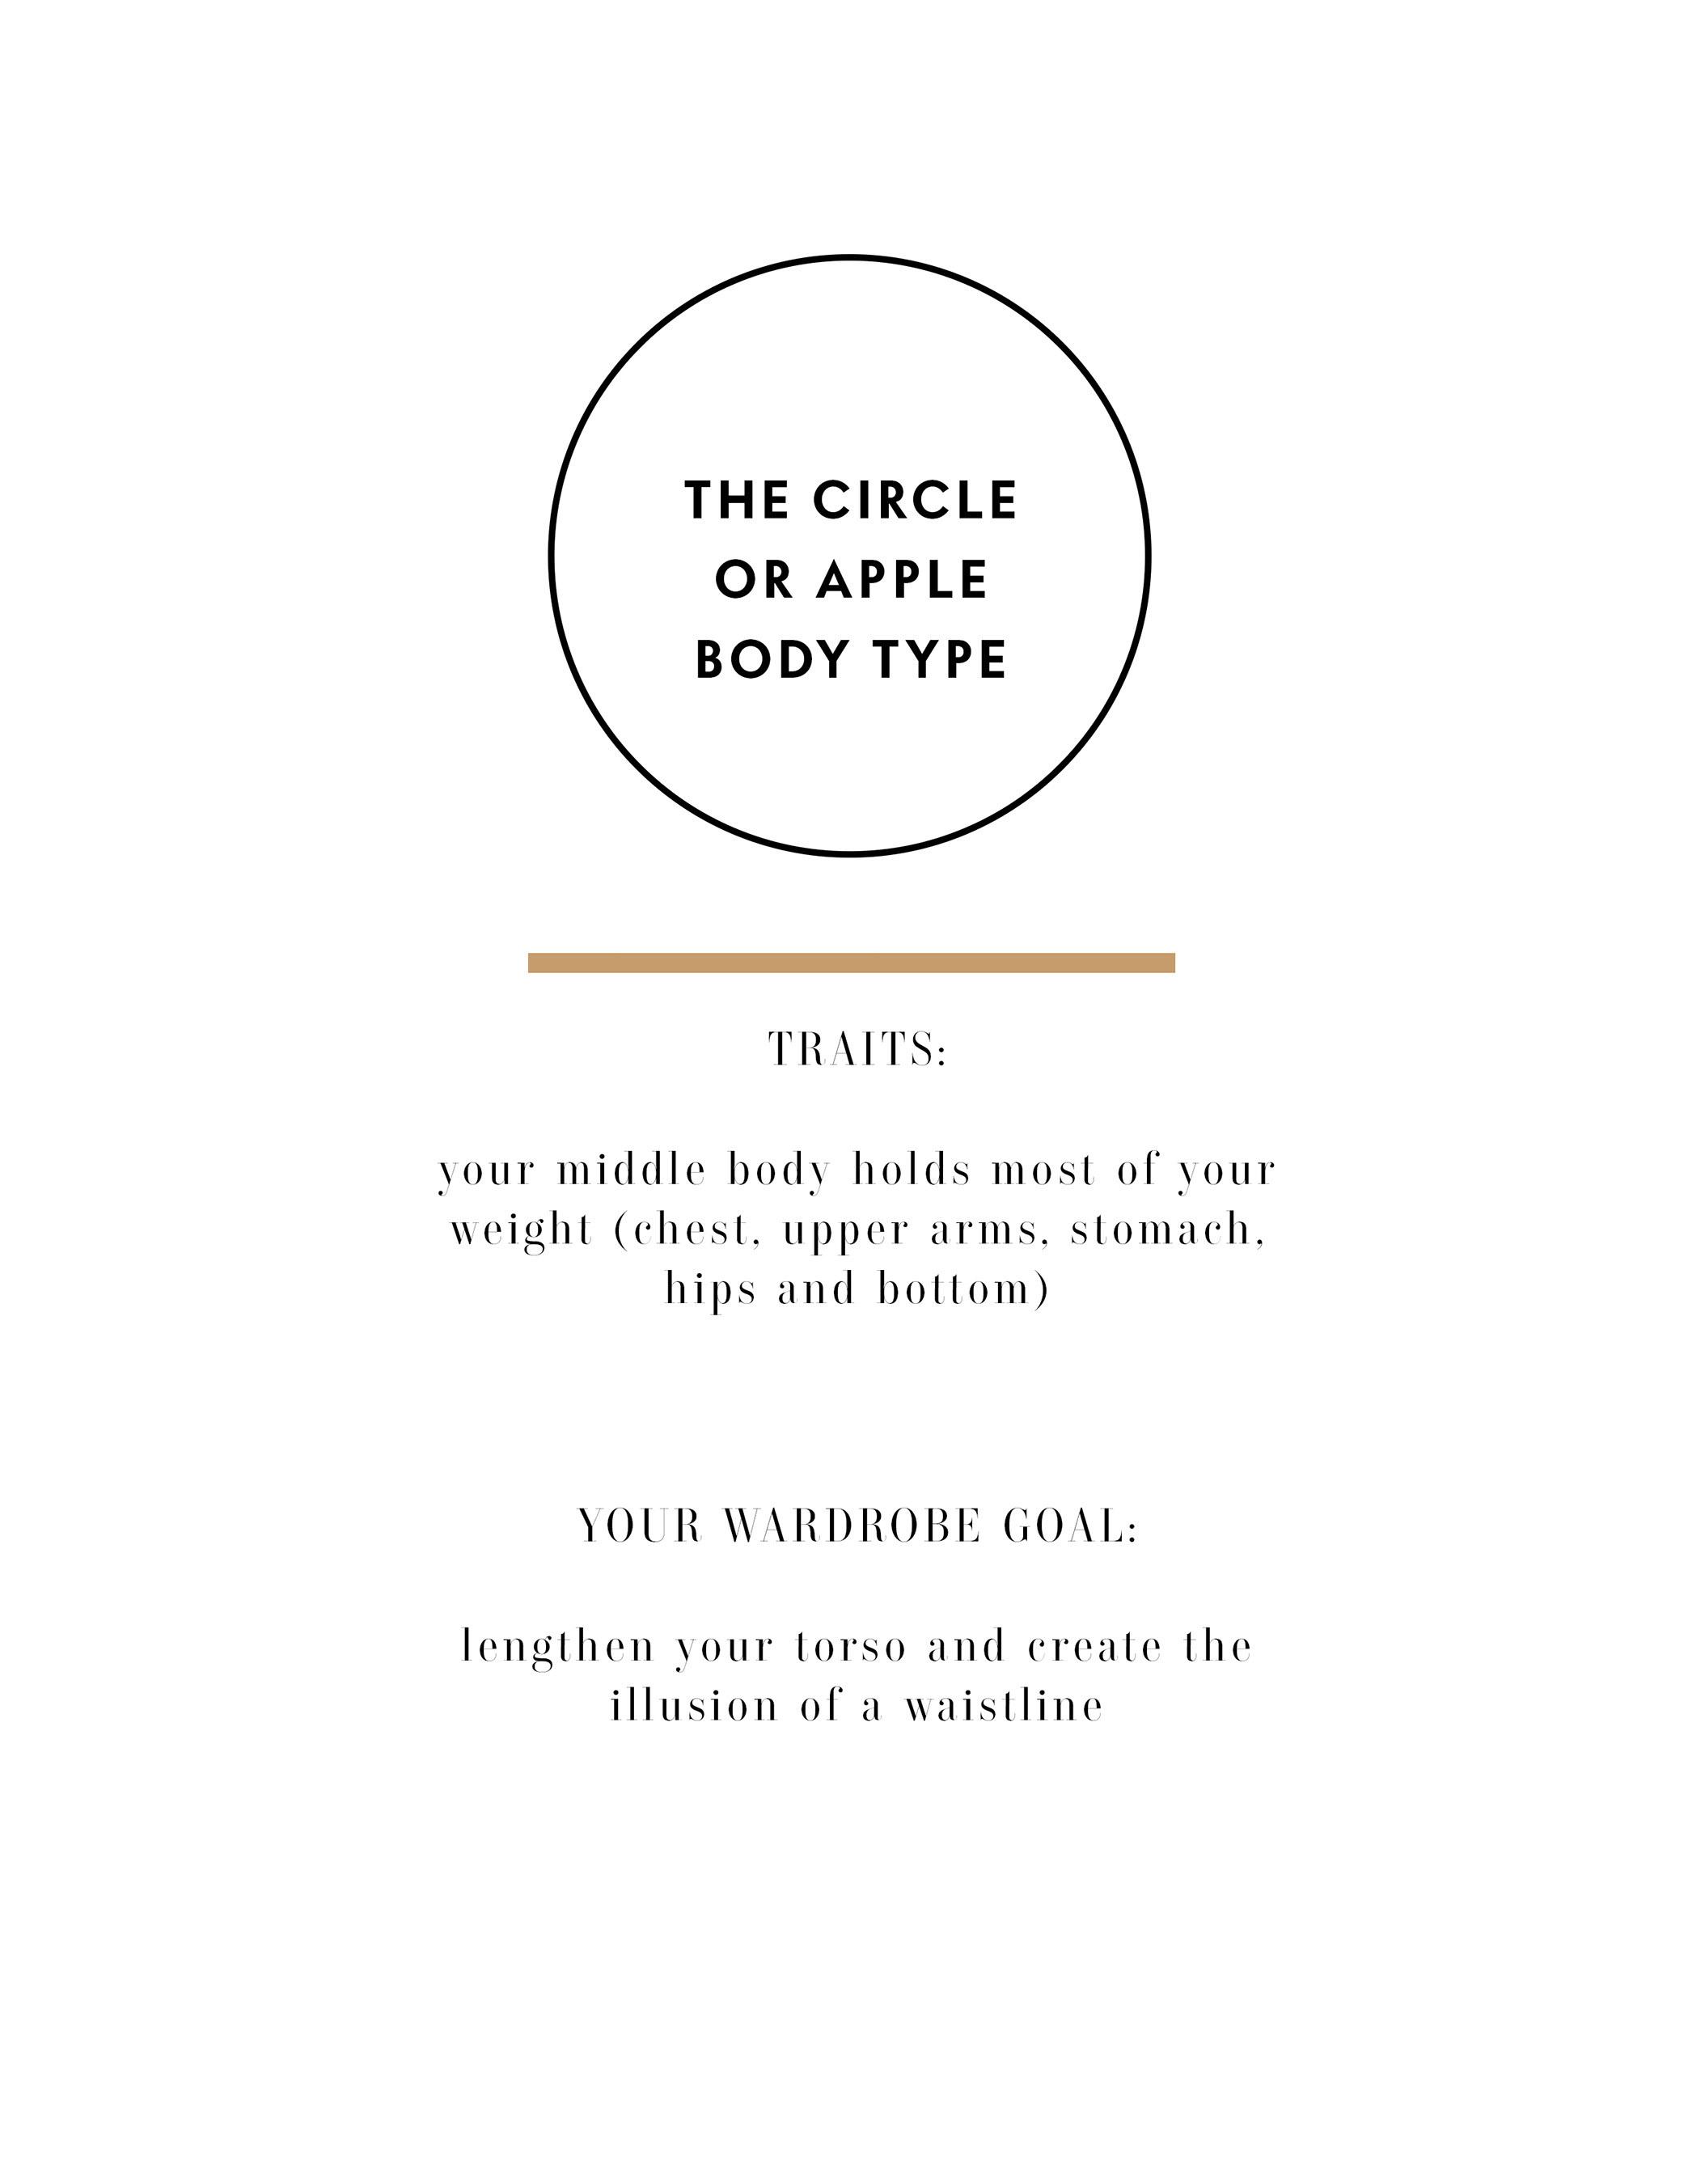 What to Wear Guide - Digital PDF-10-Left.jpg